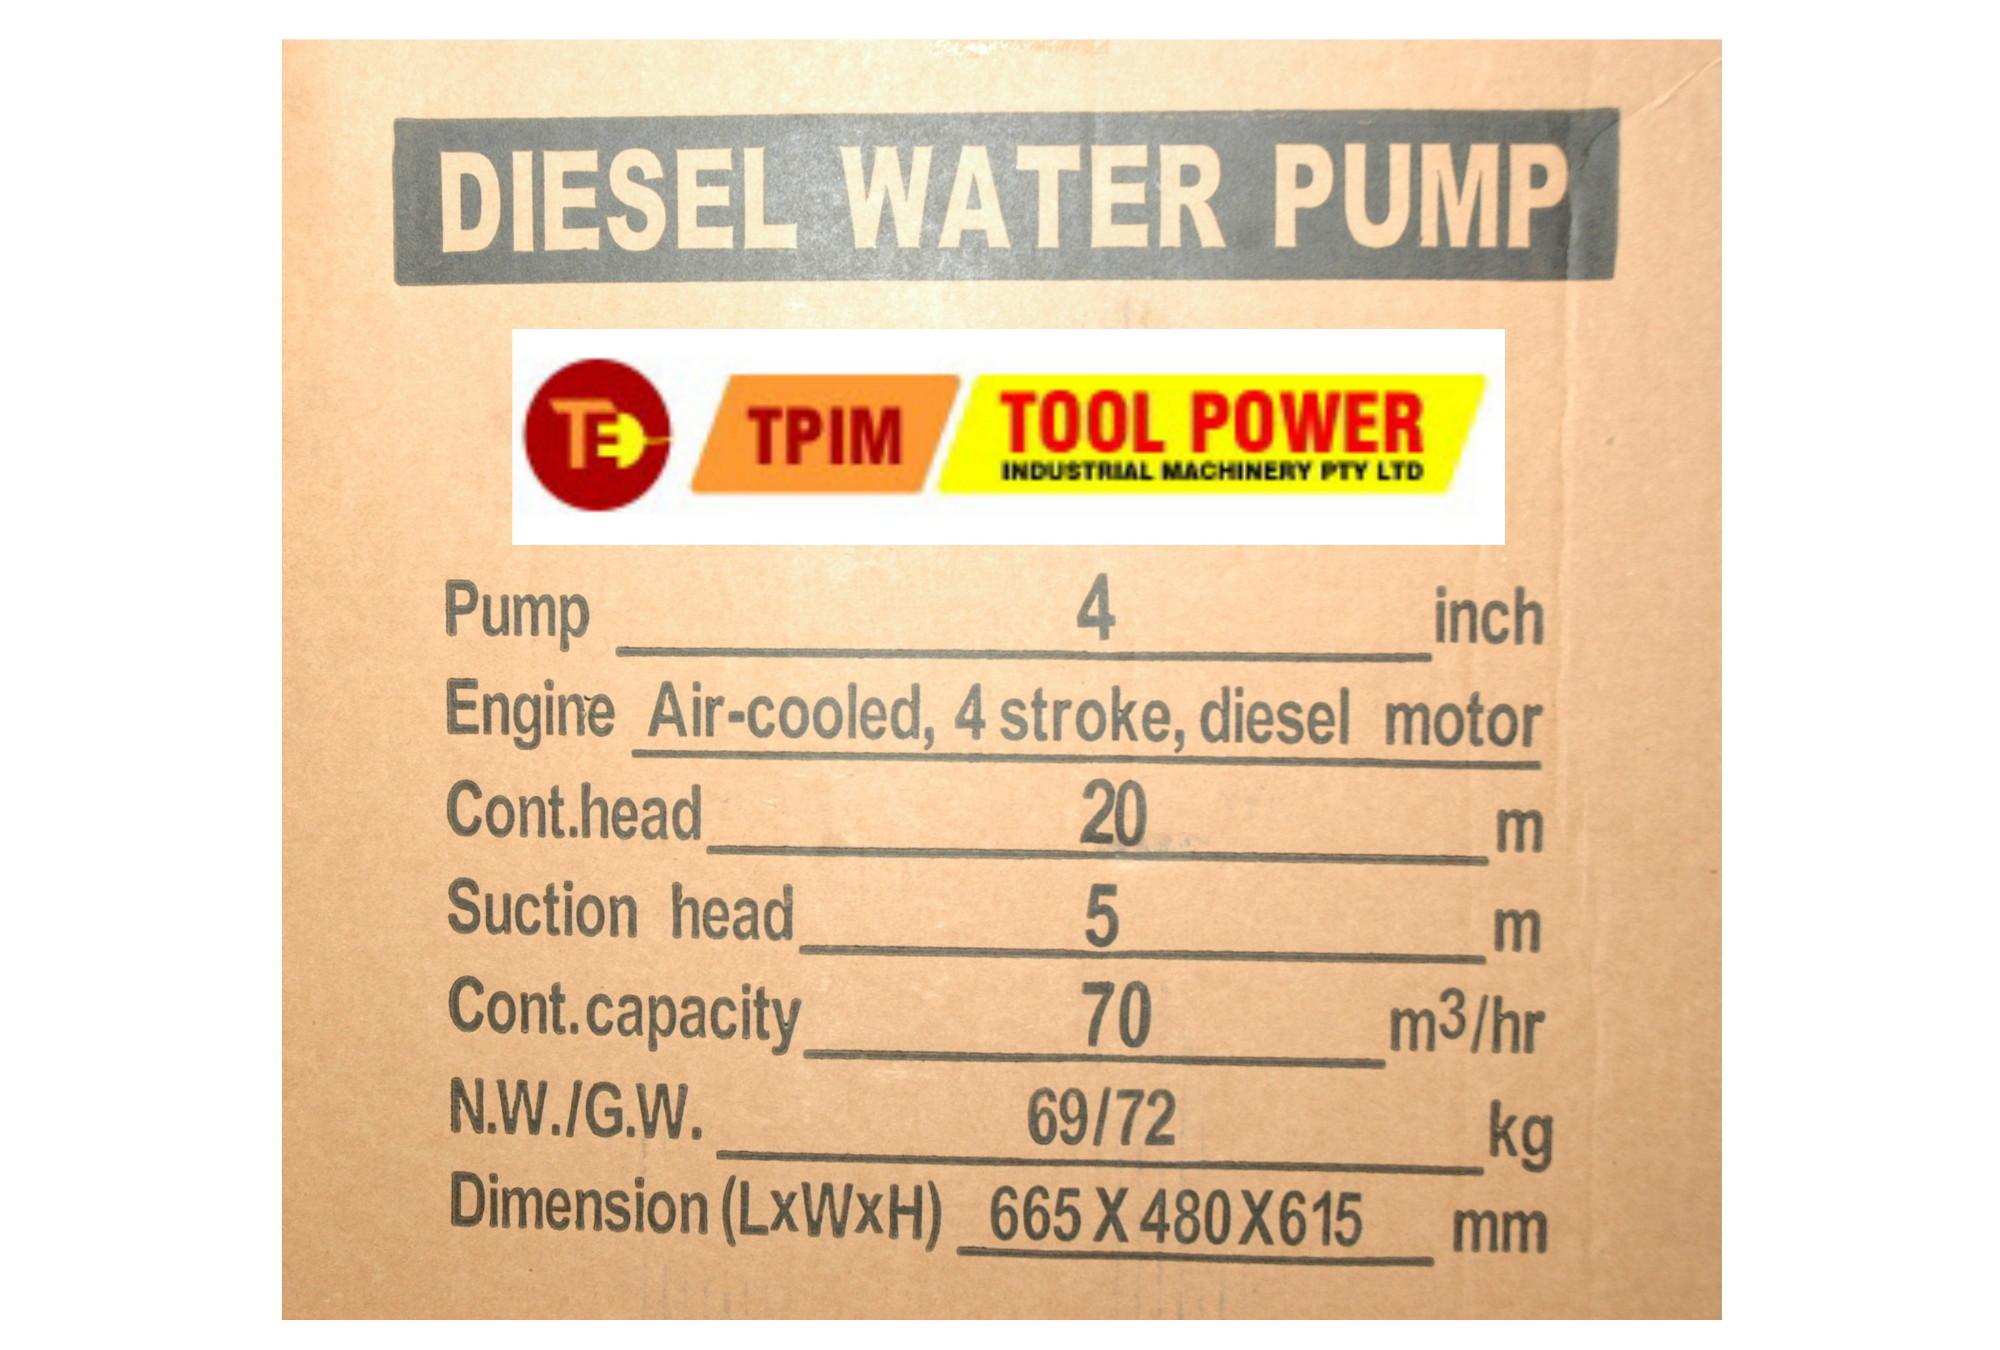 Trash water pump 10 hp